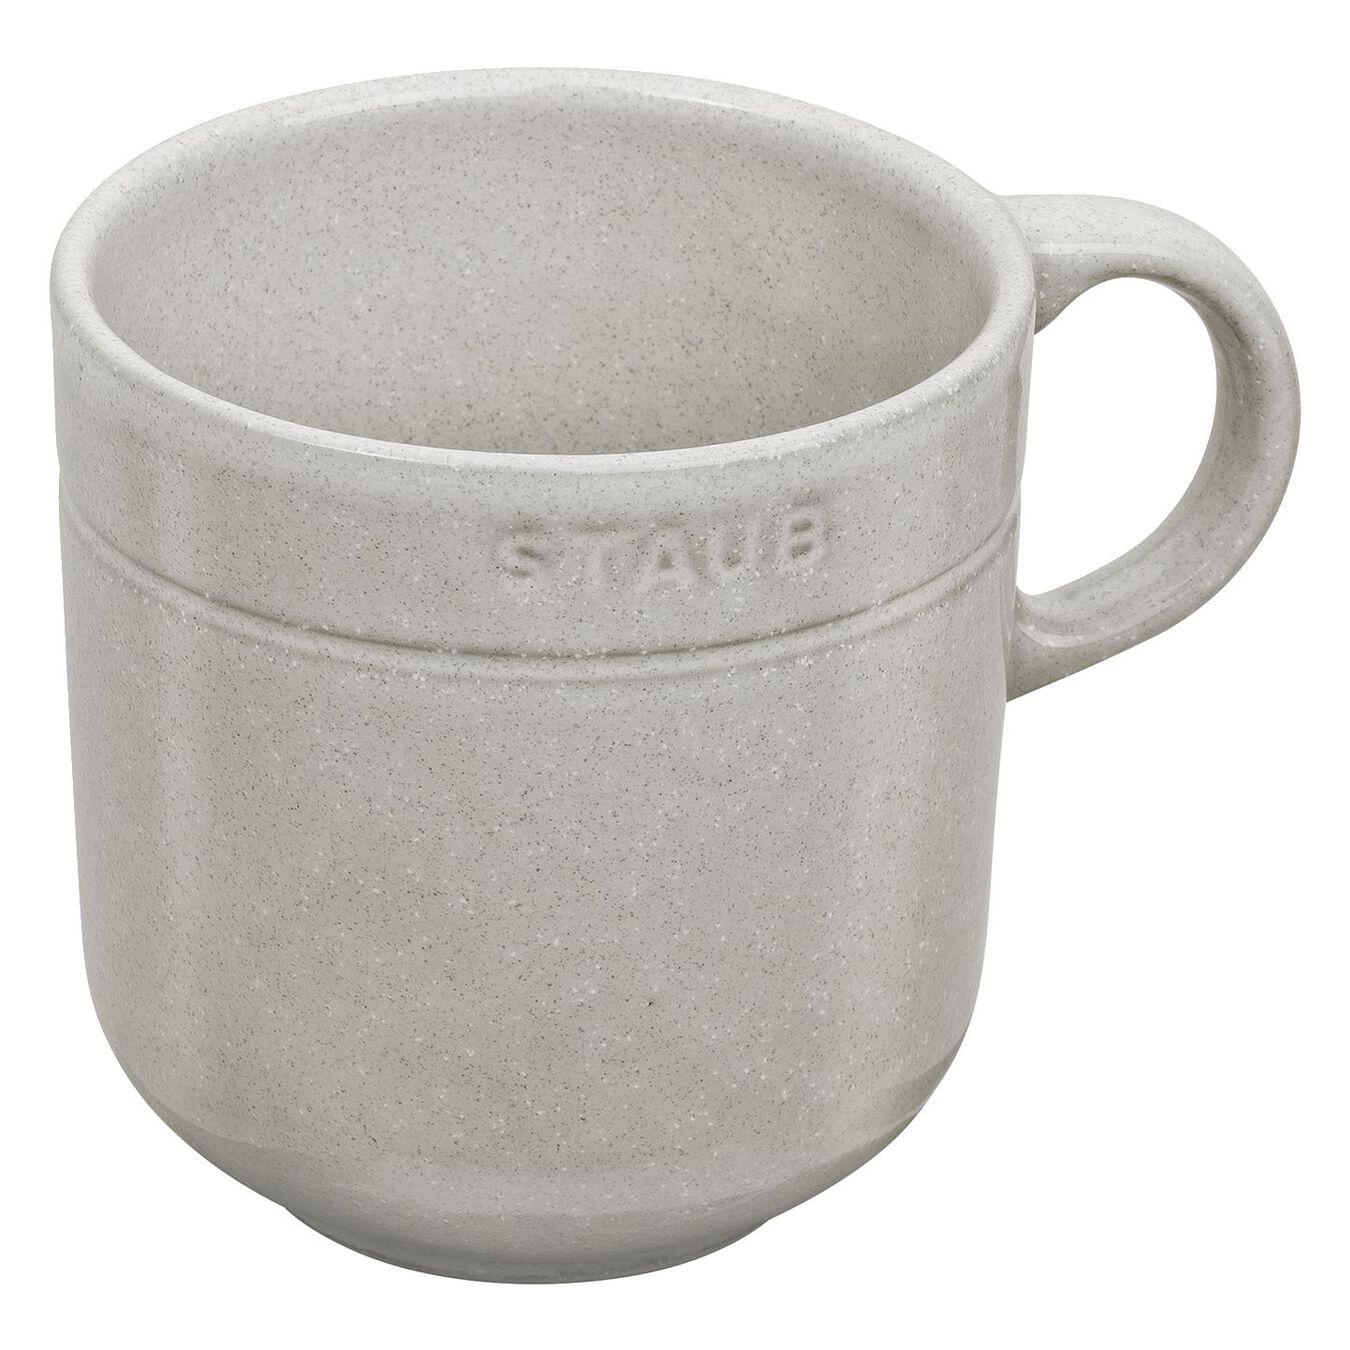 Serving set, 48 Piece | white truffle | Ceramic | Ceramic,,large 4